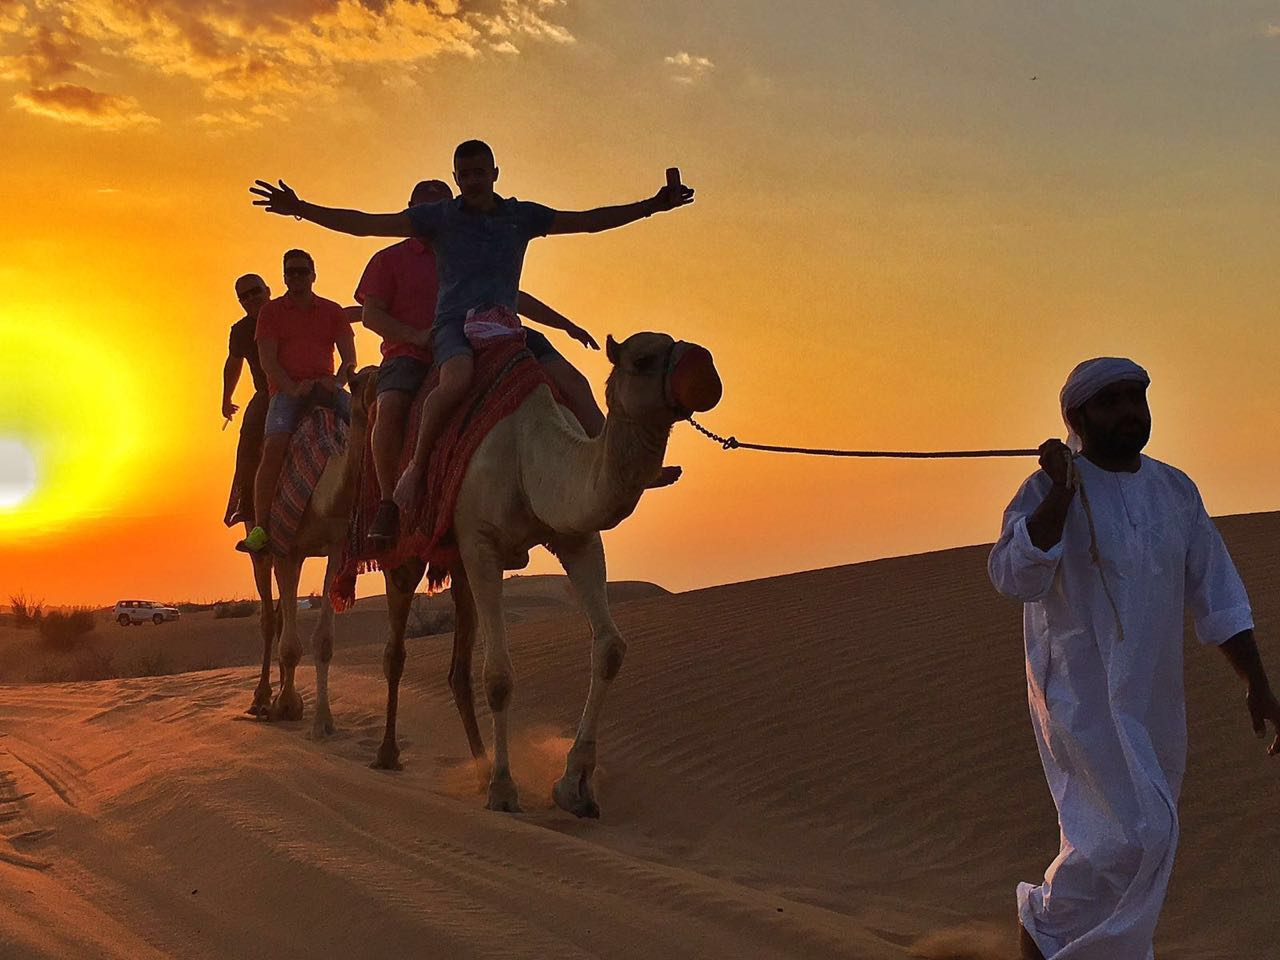 Desert Safari + Camel Ride